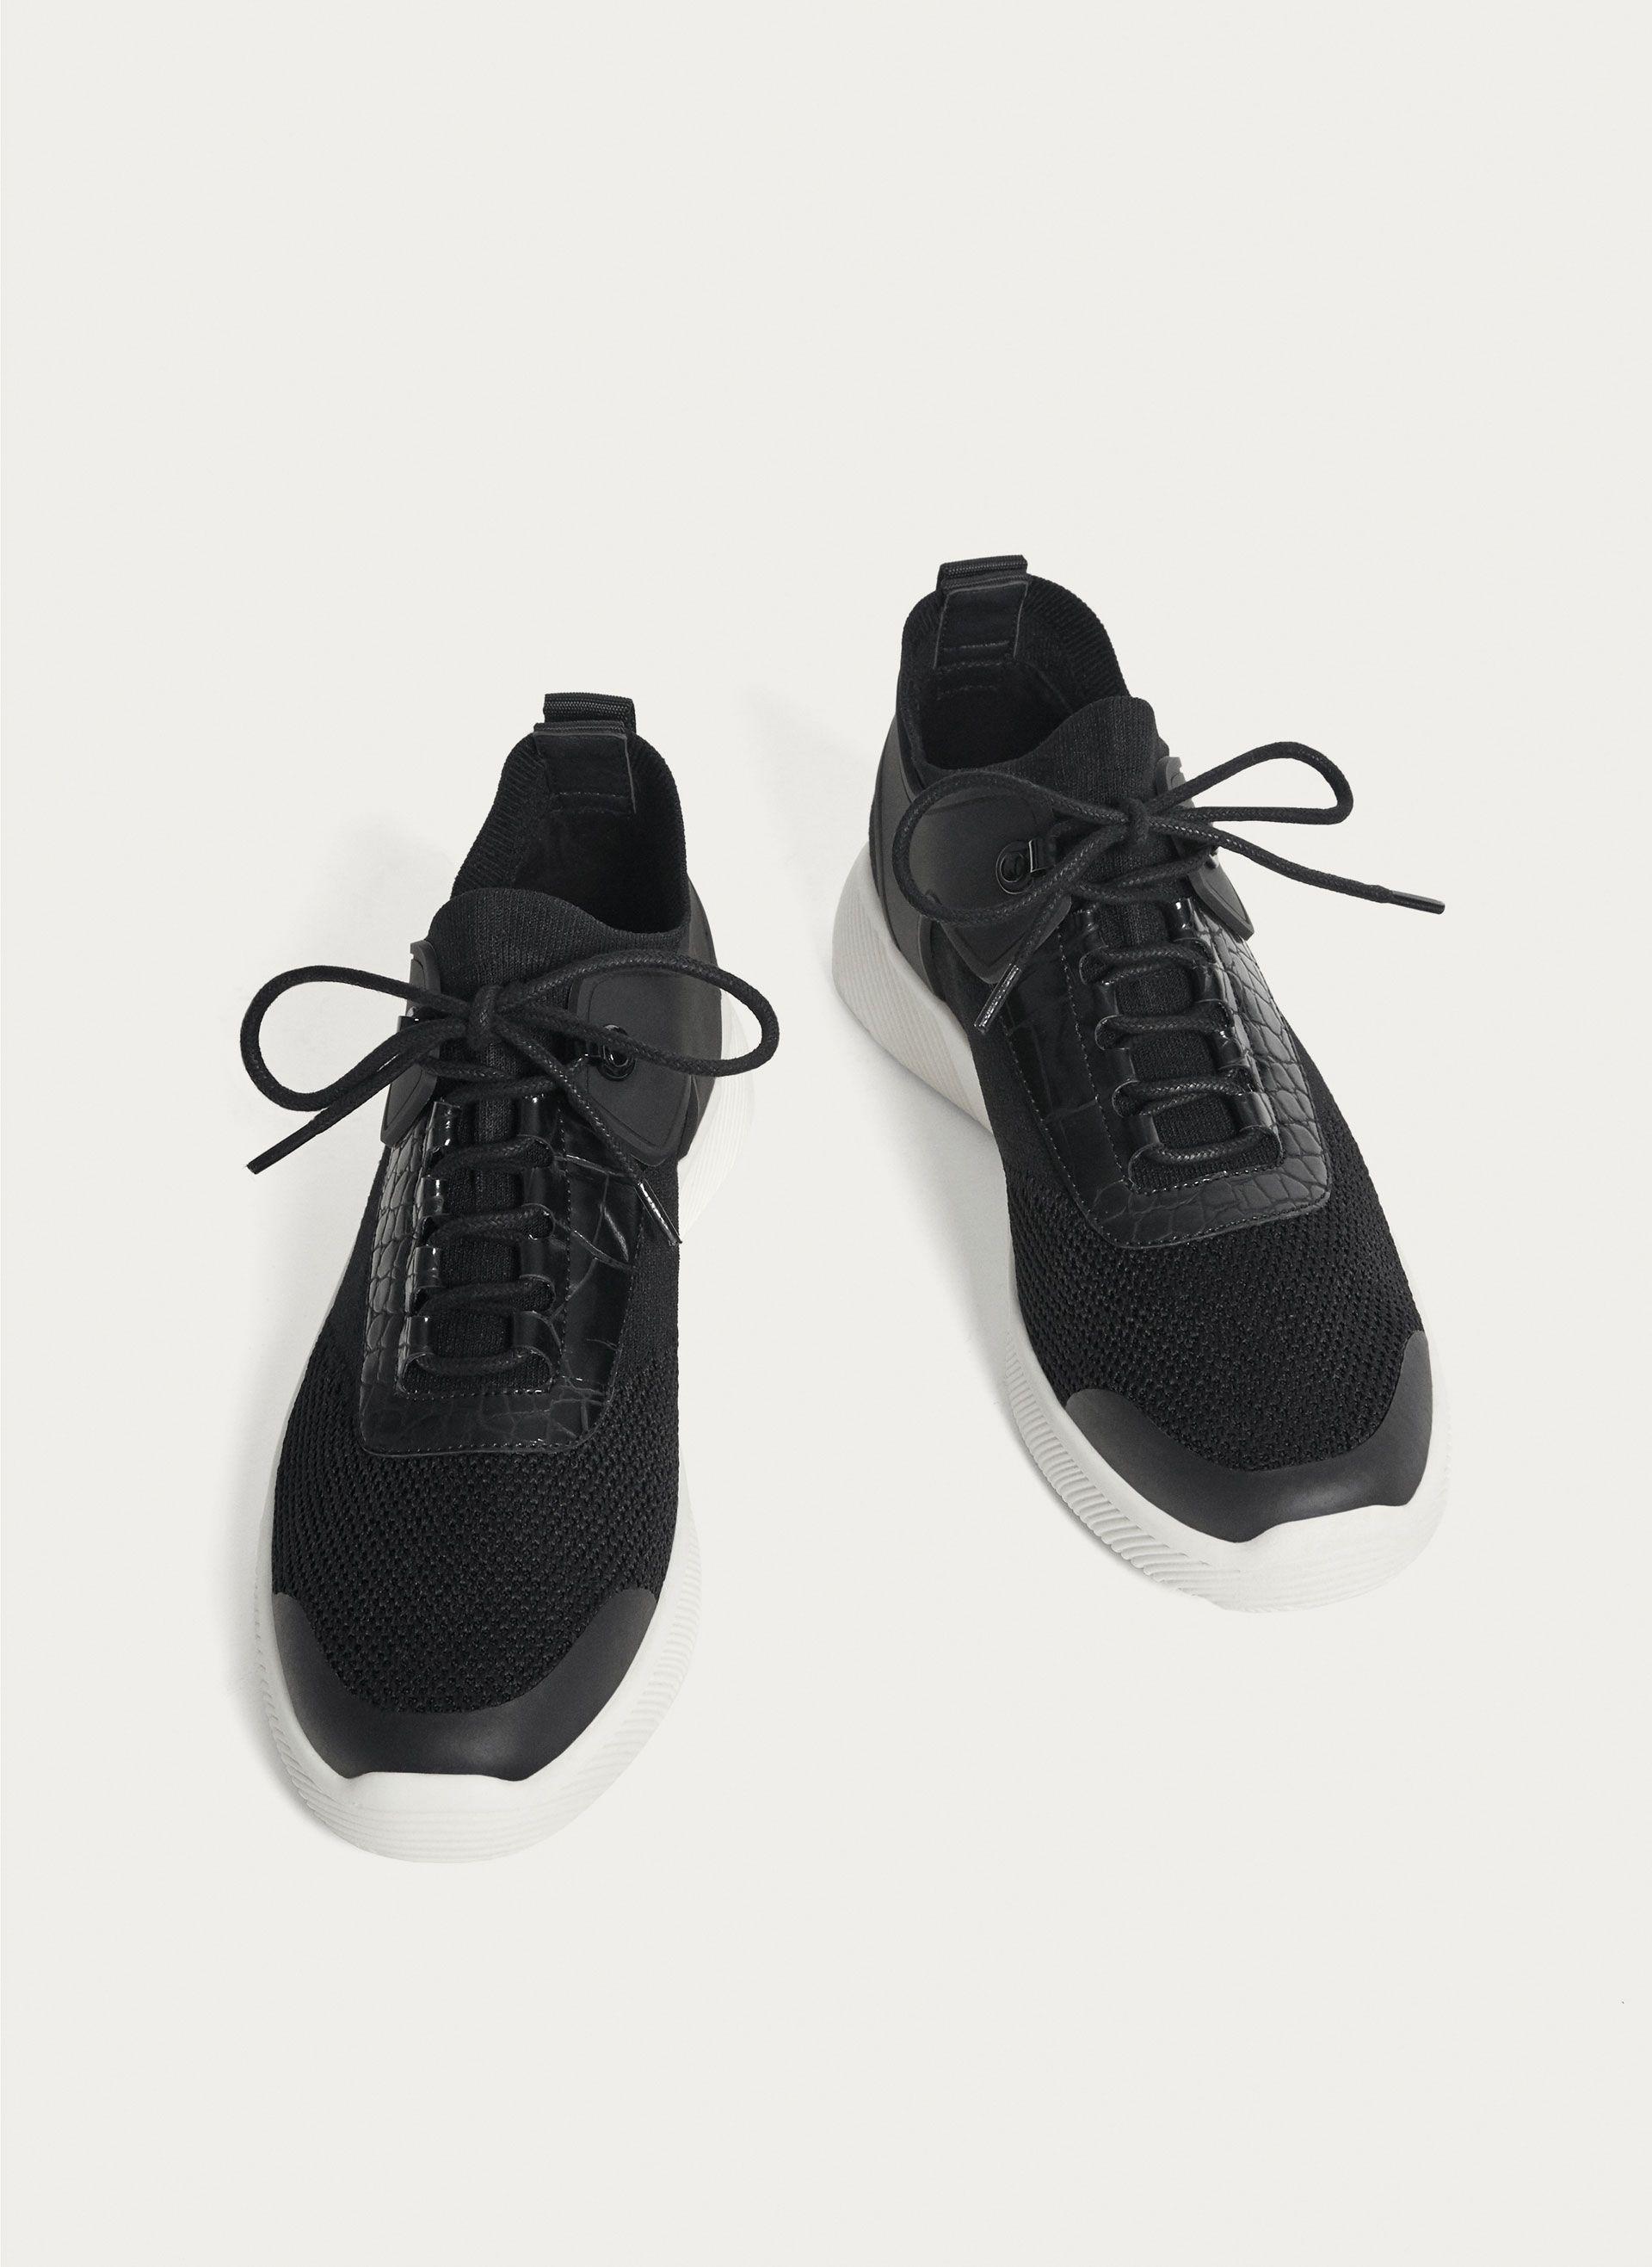 Navy blue ombre adidas superstar custom shoes | Zapatos